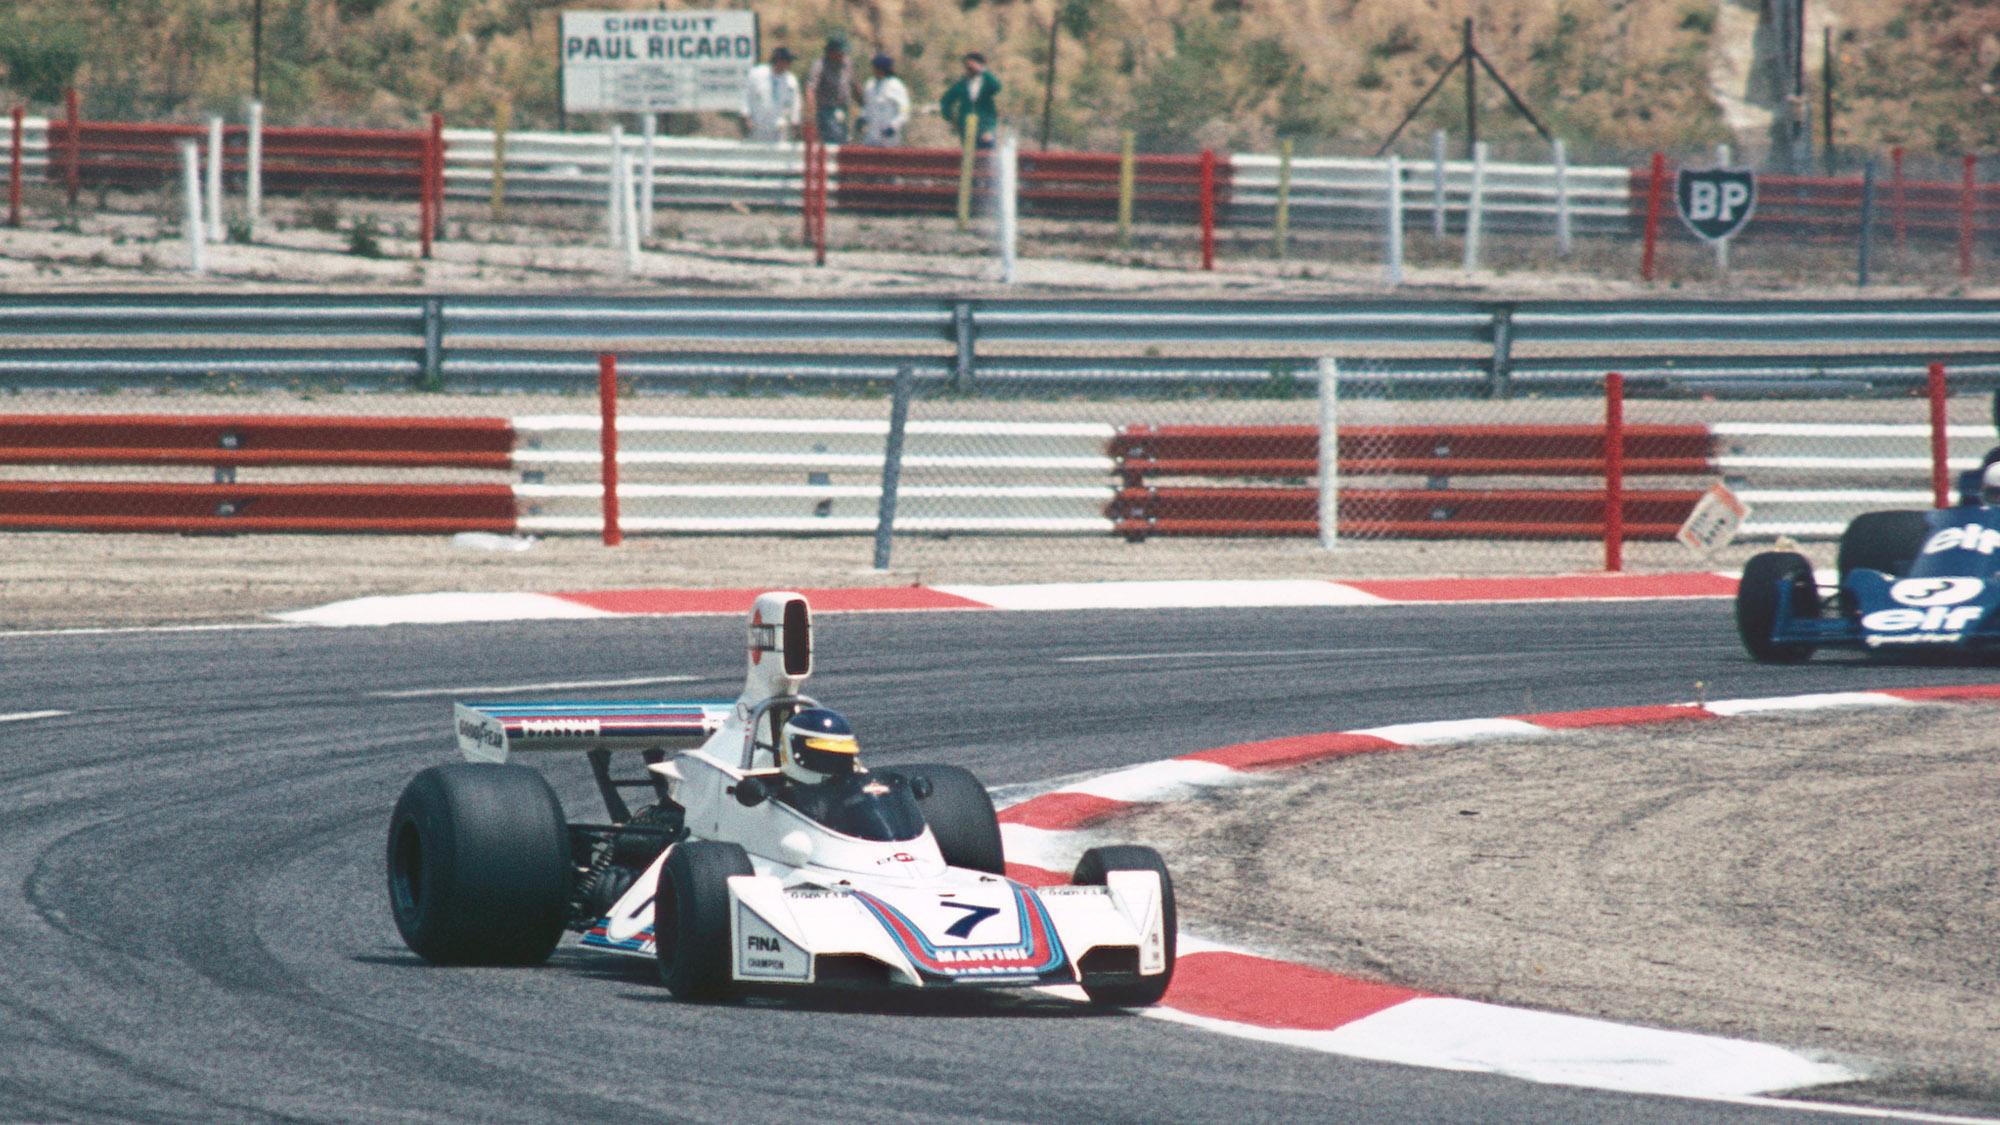 Brabham BT44B of Carlos Reutemann at Paul Ricard in 1975